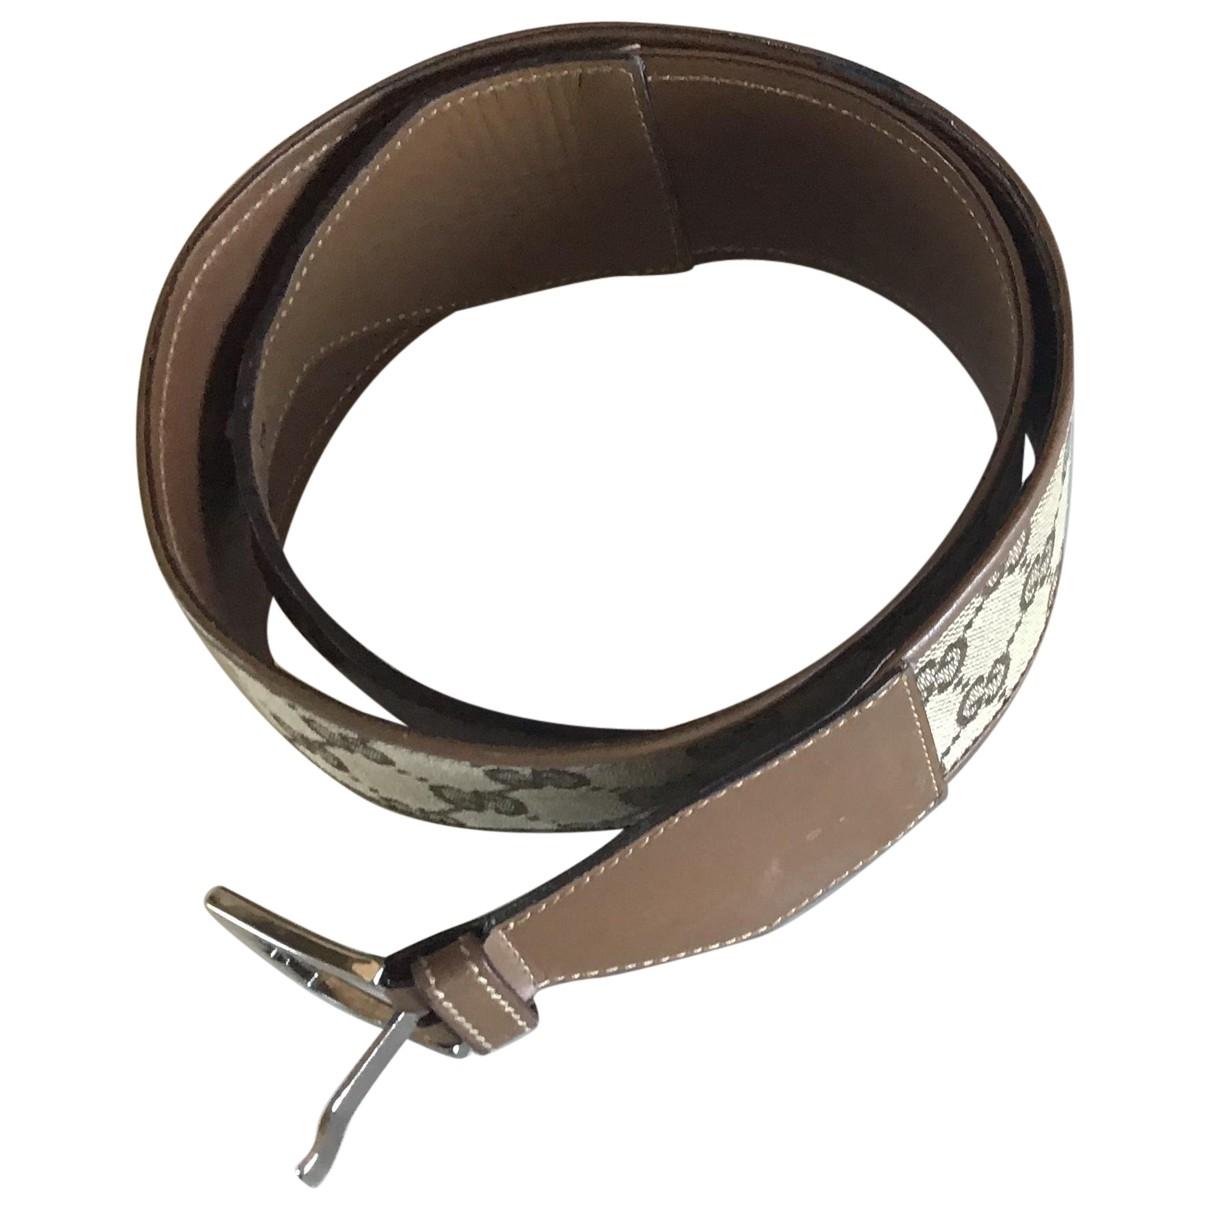 Gucci \N Brown Cloth belt for Women S International